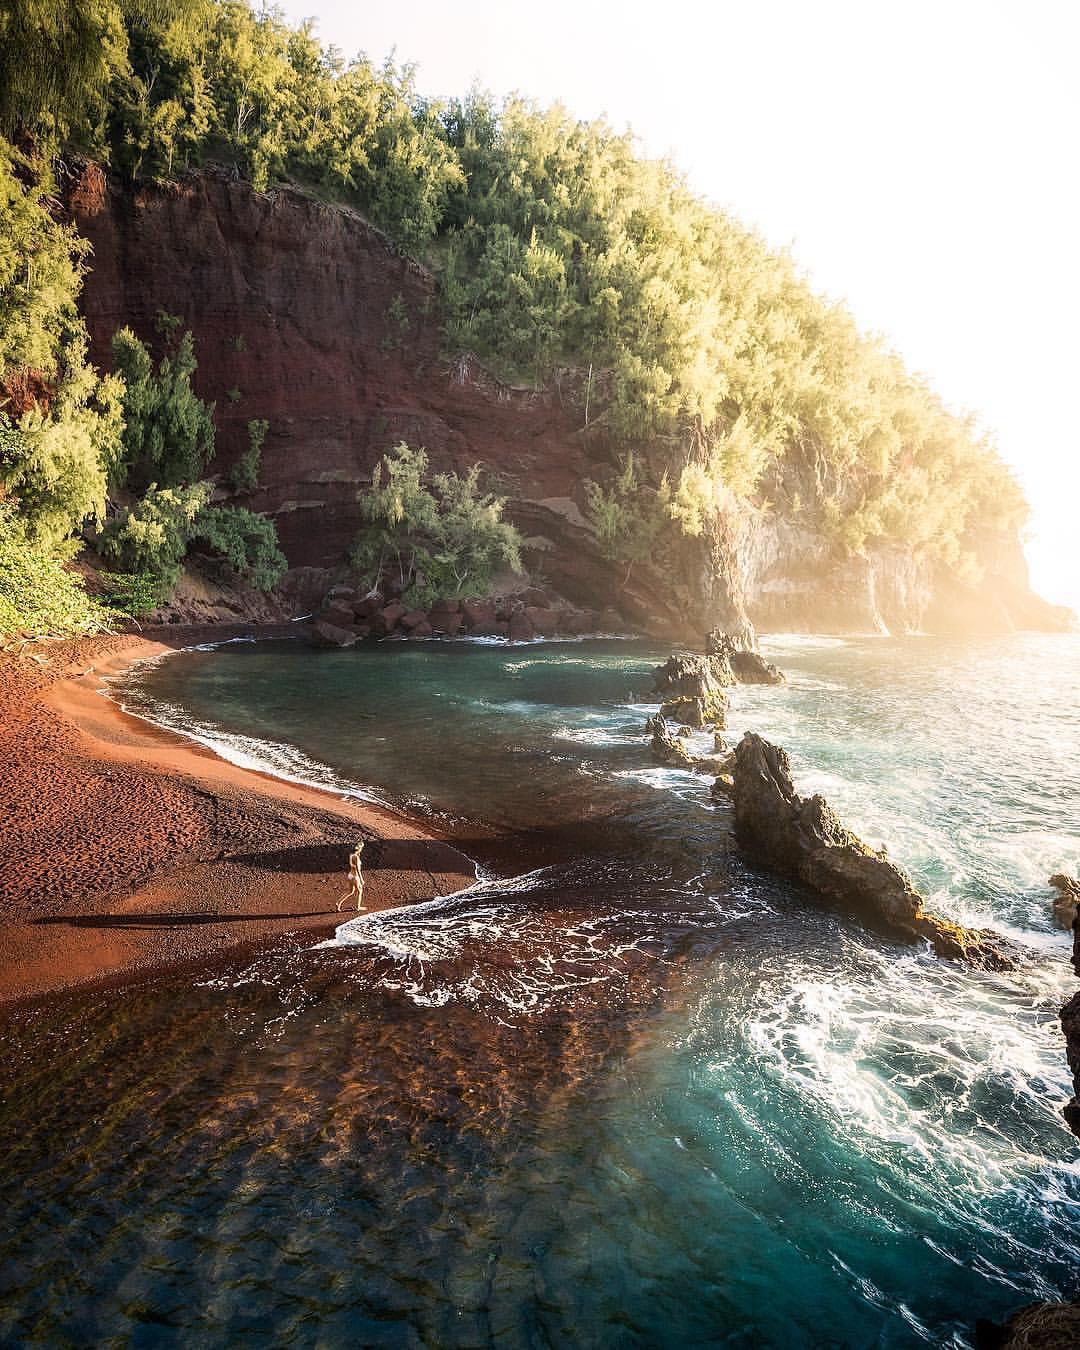 Red Sand Beach / Kaihalulu Beach - best things to do in maui hawaii